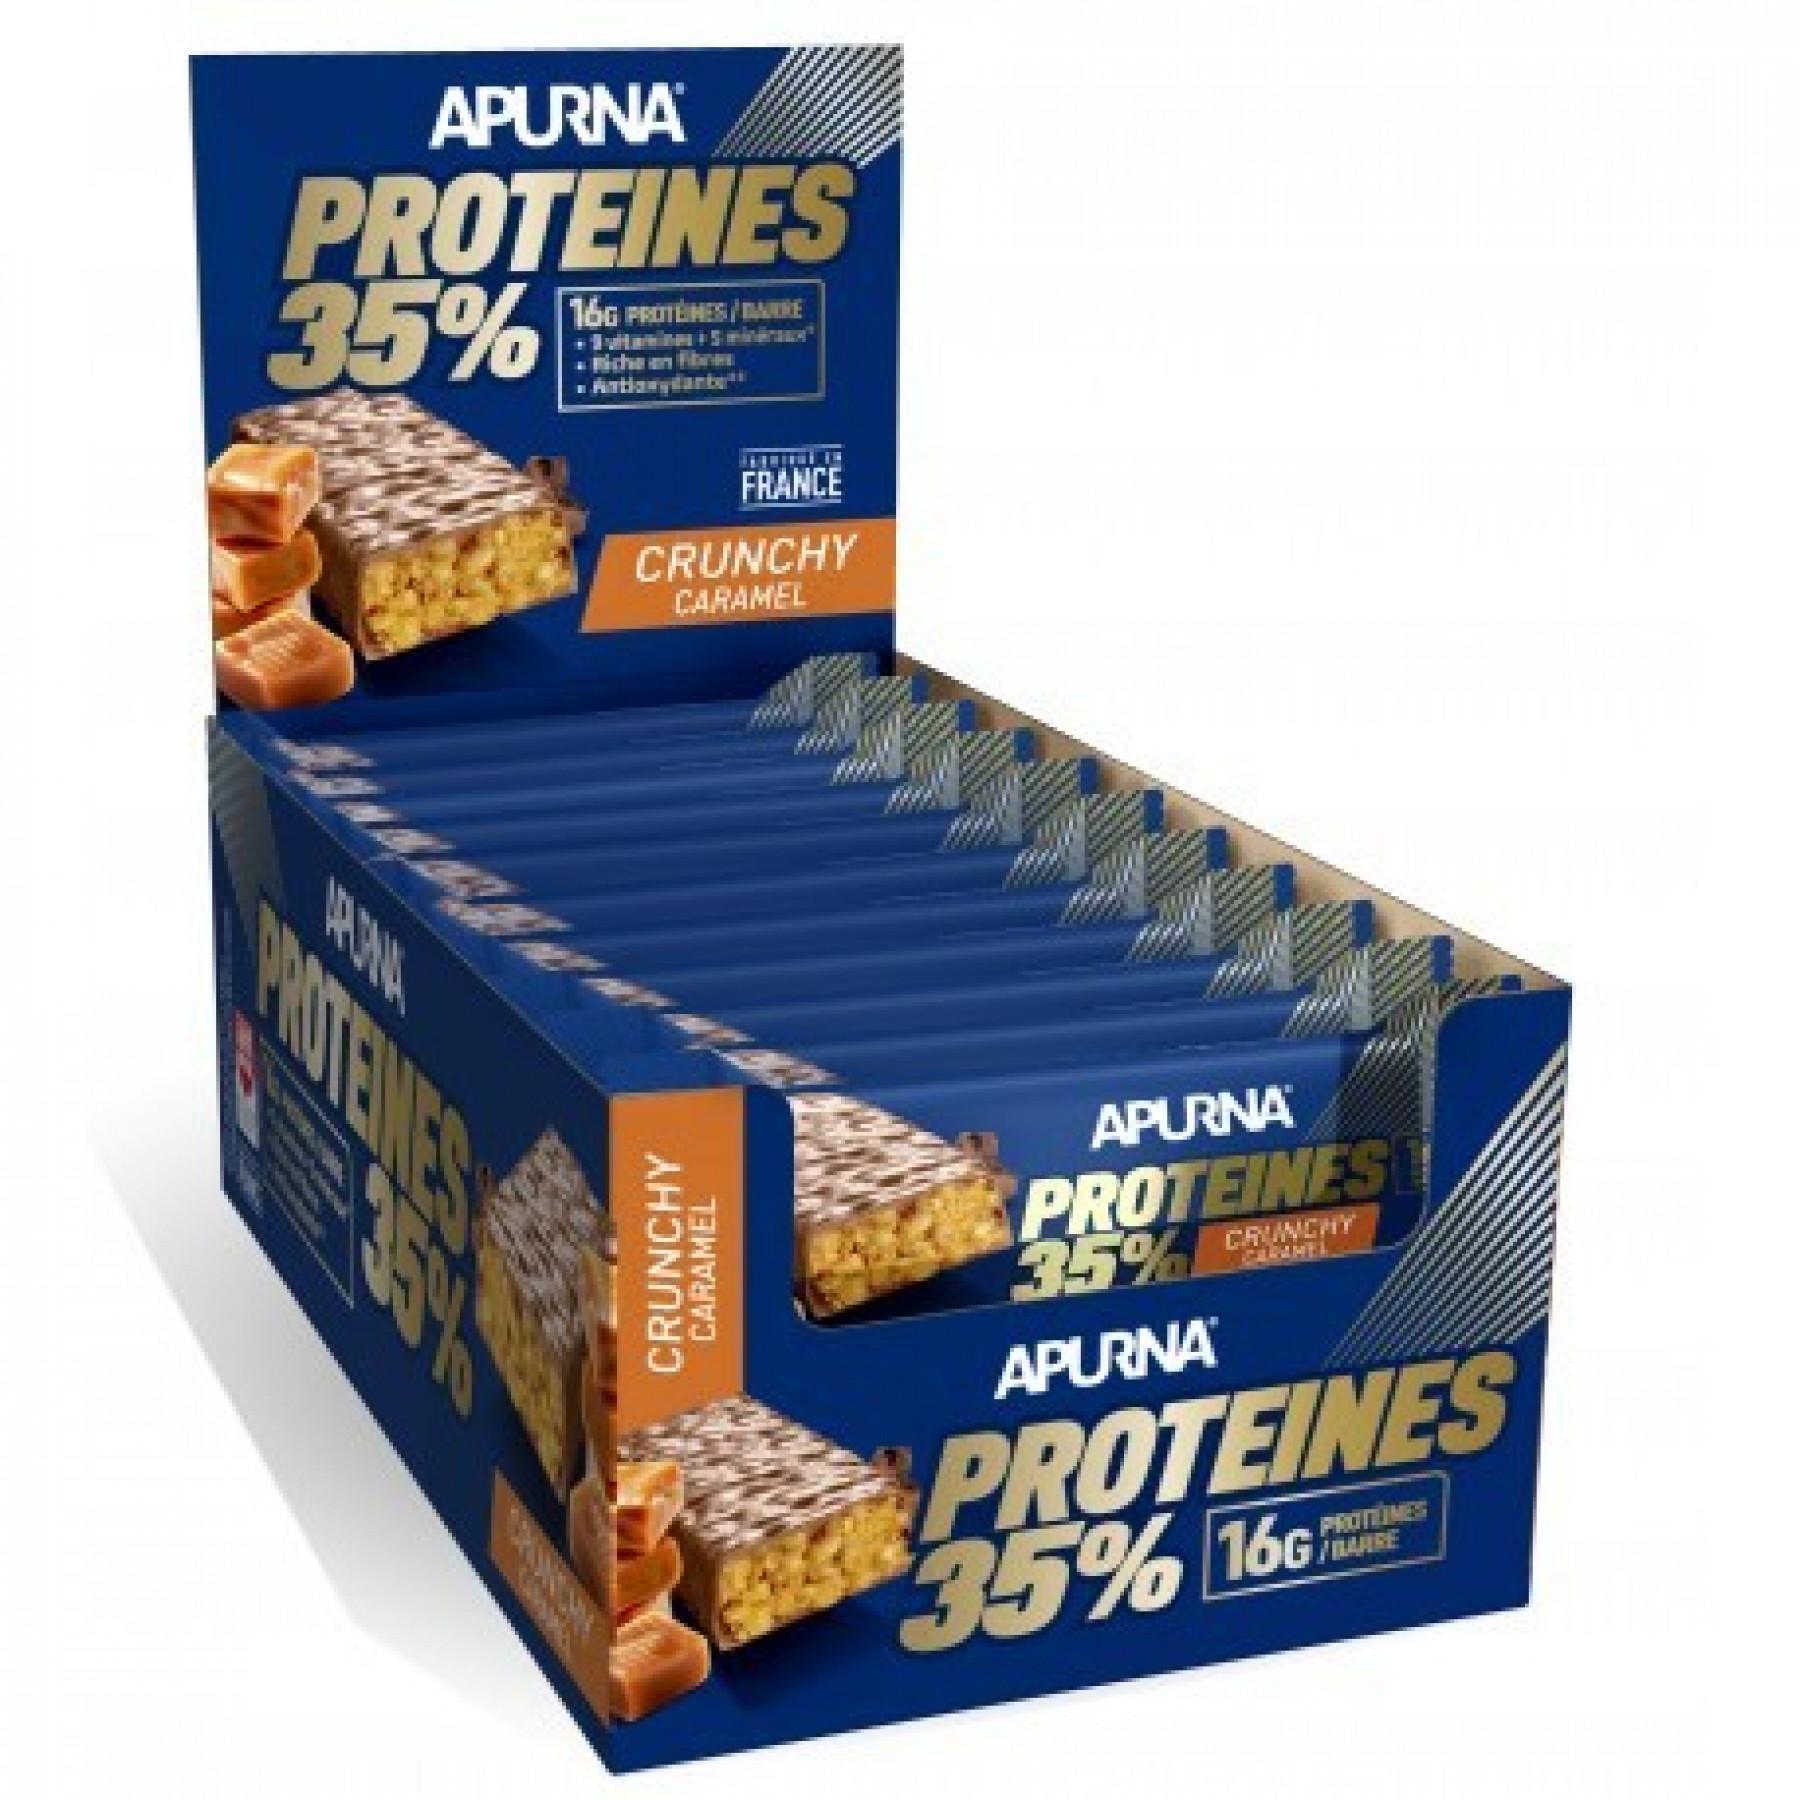 Pack of 20 bars Apurna HP Crunchy Caramel-Chocolat